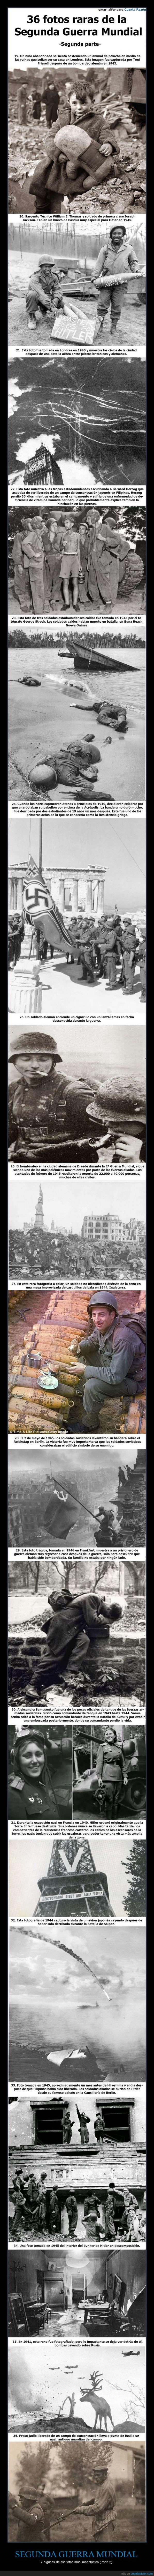 1945,alemania,cuerpo curioso,fotos,guerra,Hitler,holocausto,impactante,inglaterra,judios,Lo lamento si es muy largo,marina,nazi,niños,piloto,prisioneros,raro,rusia,segunda guerra mundial,urss,usa,wwii